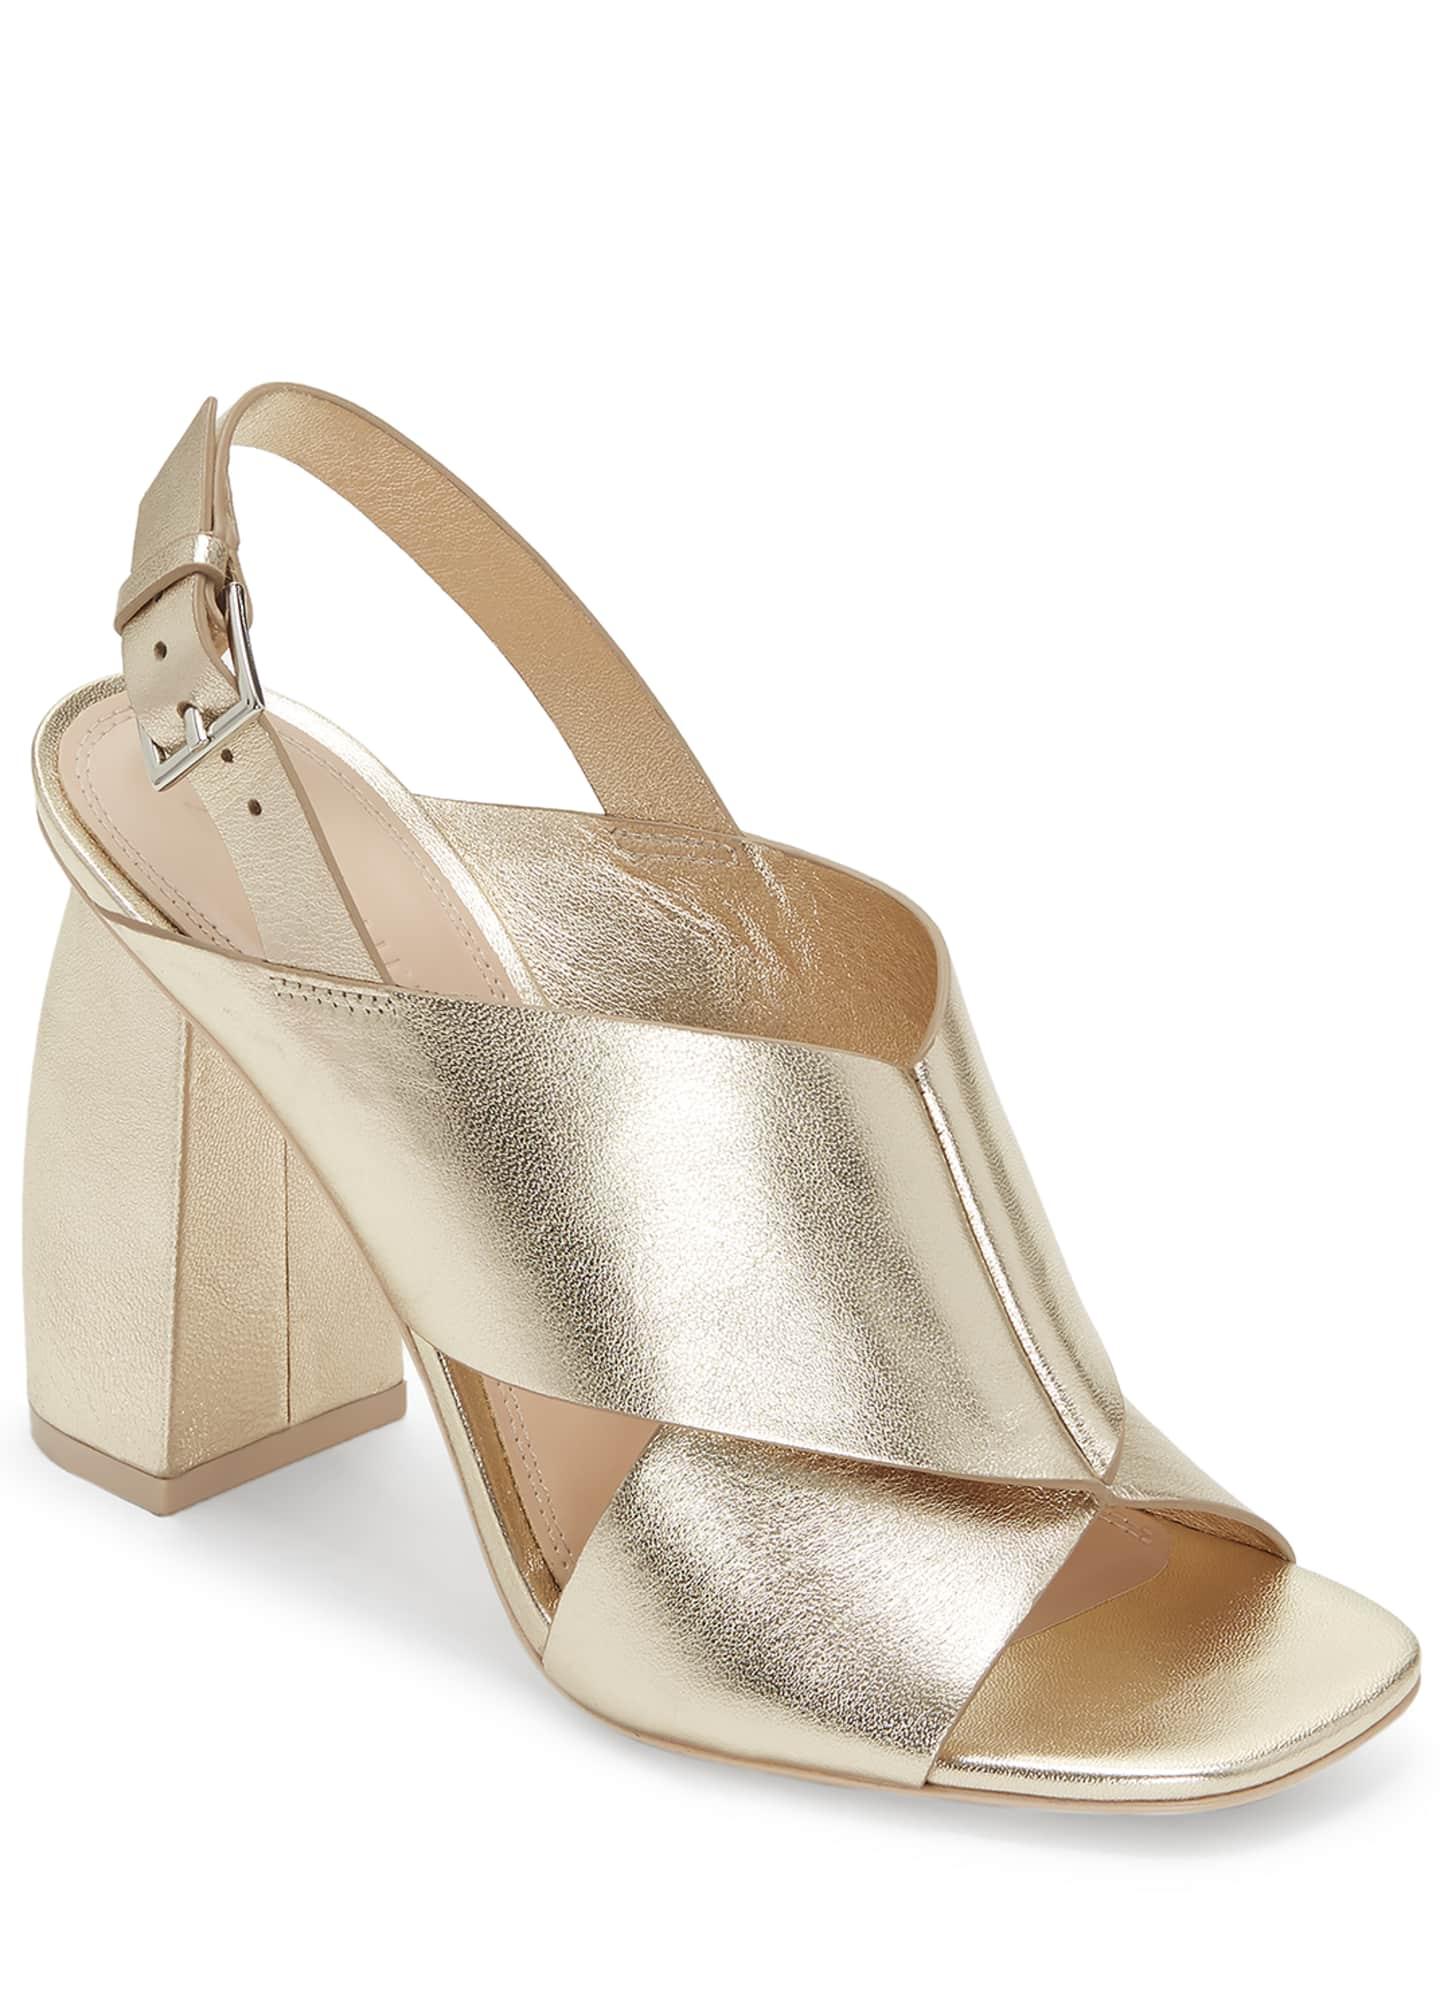 Mercedes Castillo Hae Crisscross High Sandals